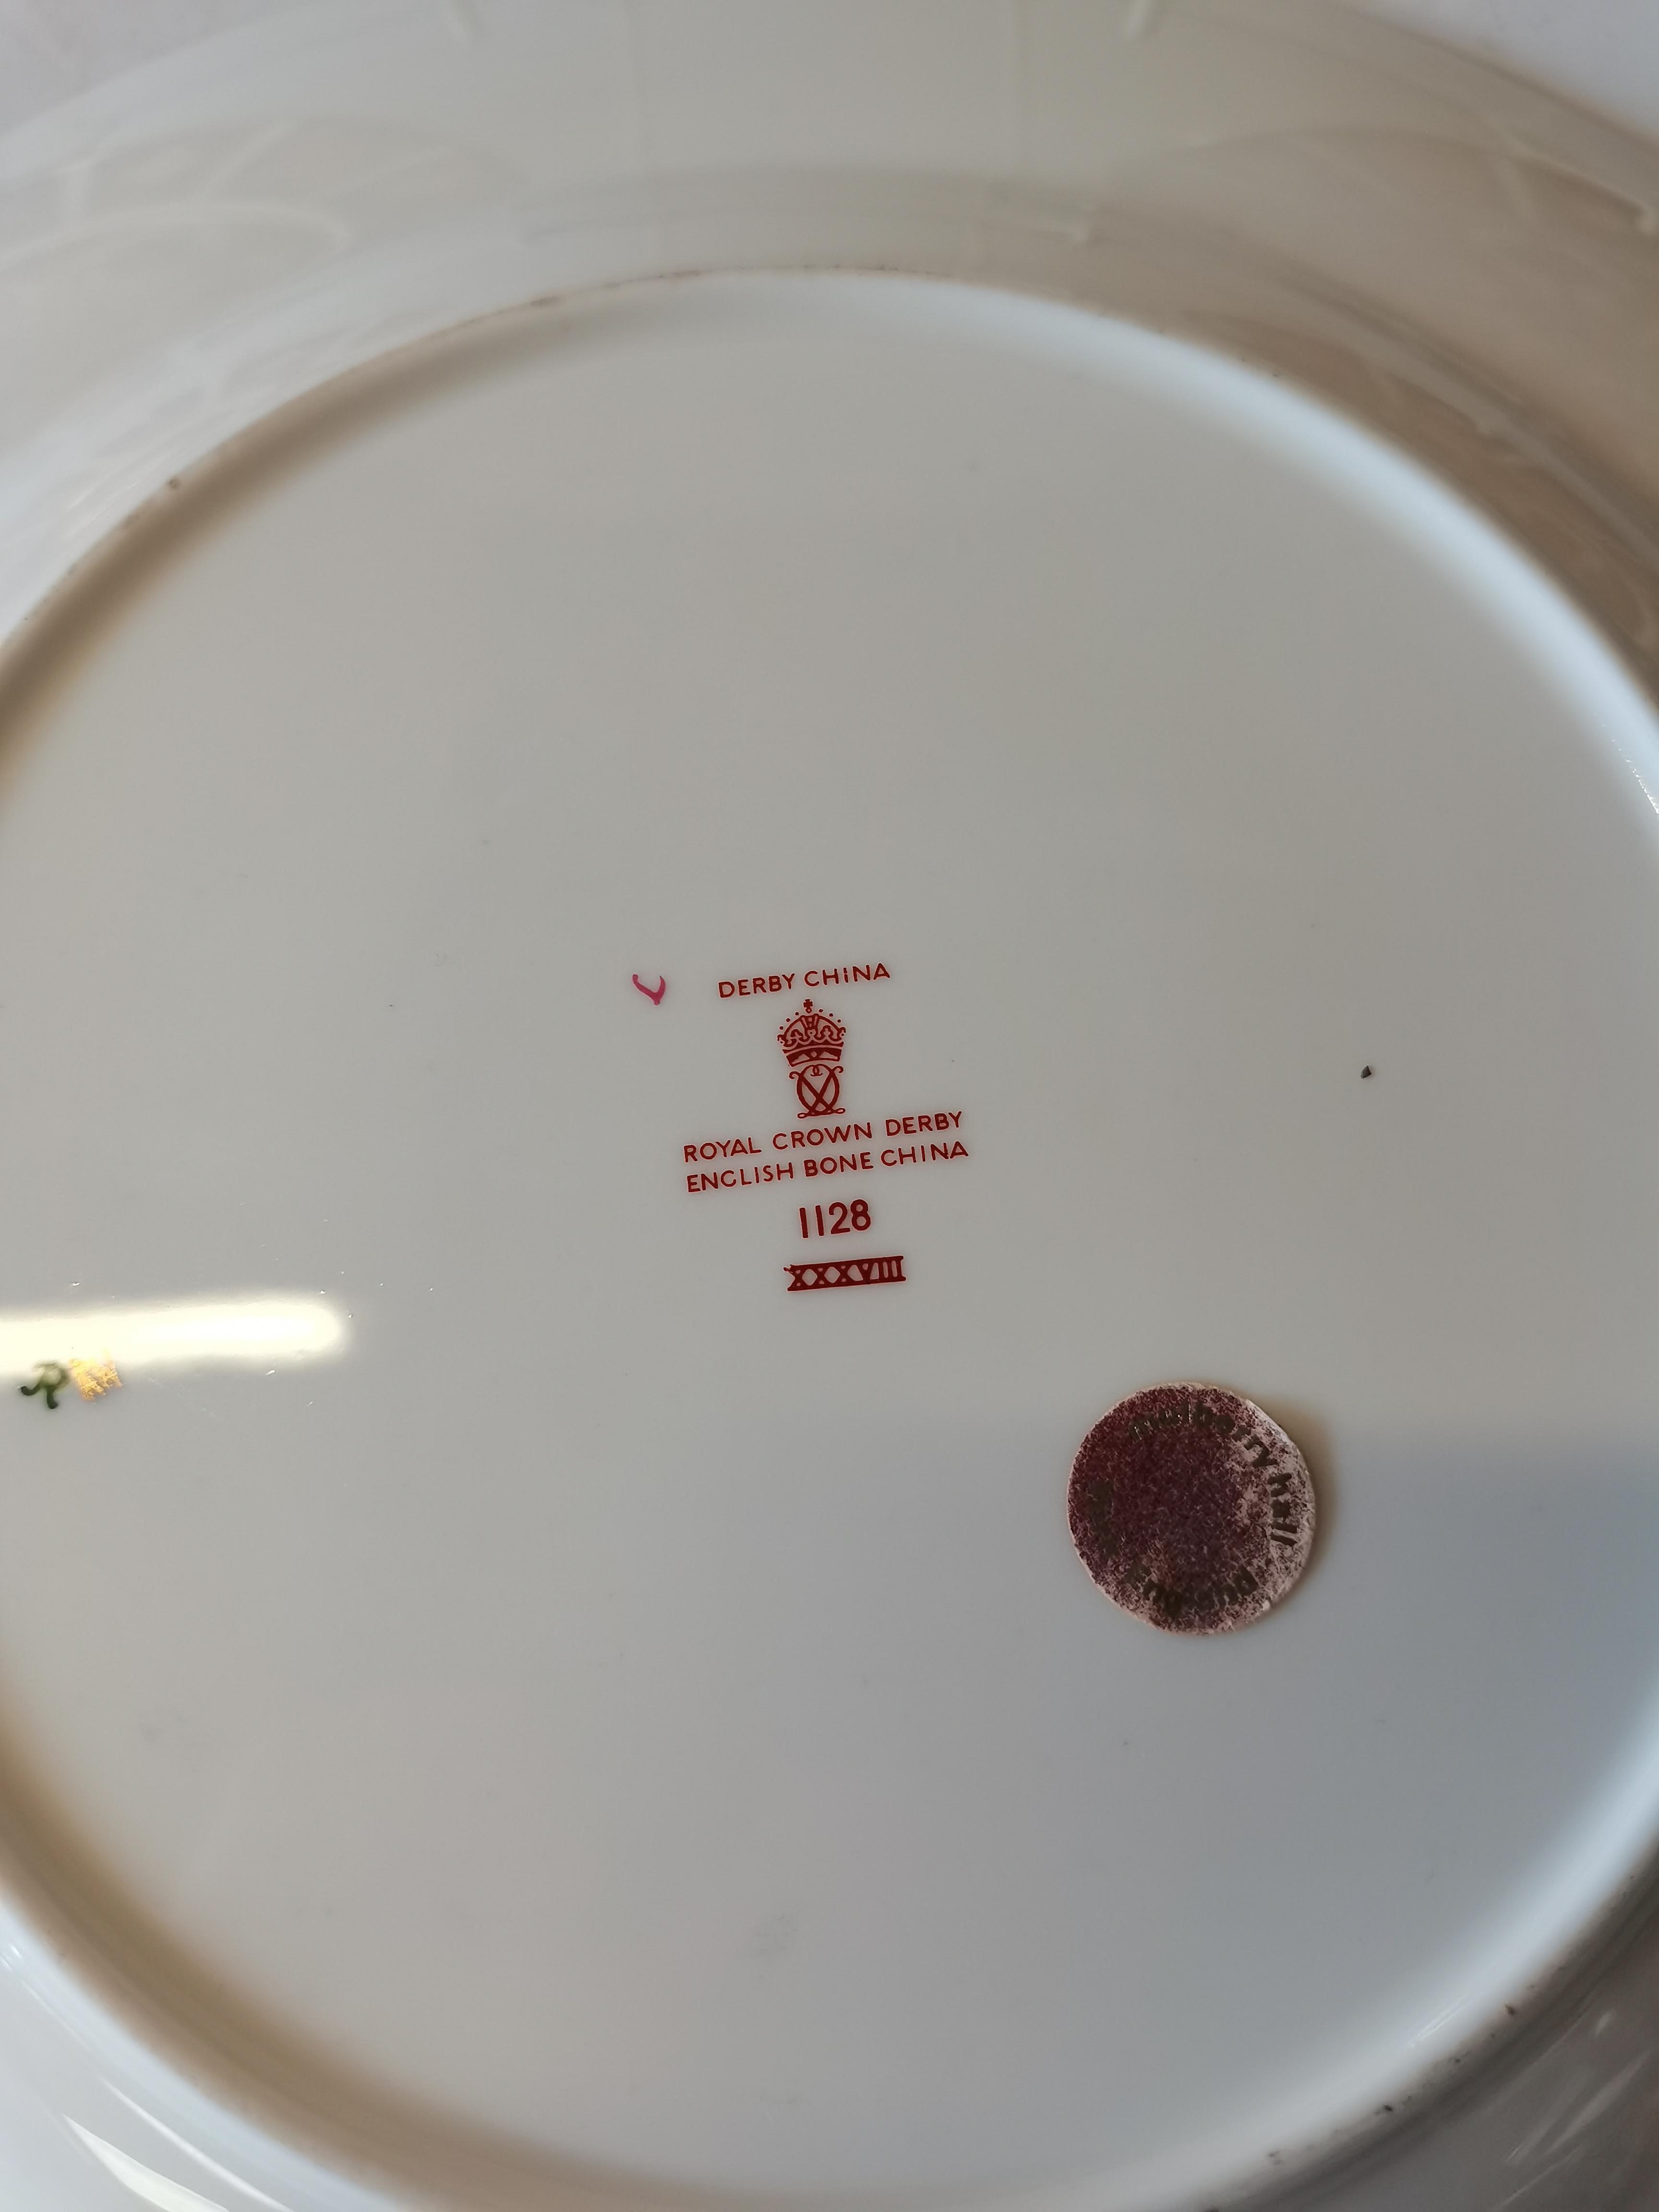 3 Royal Crown Derby Imari Pattern 1128 Dinner Plates 27cm - Image 2 of 2